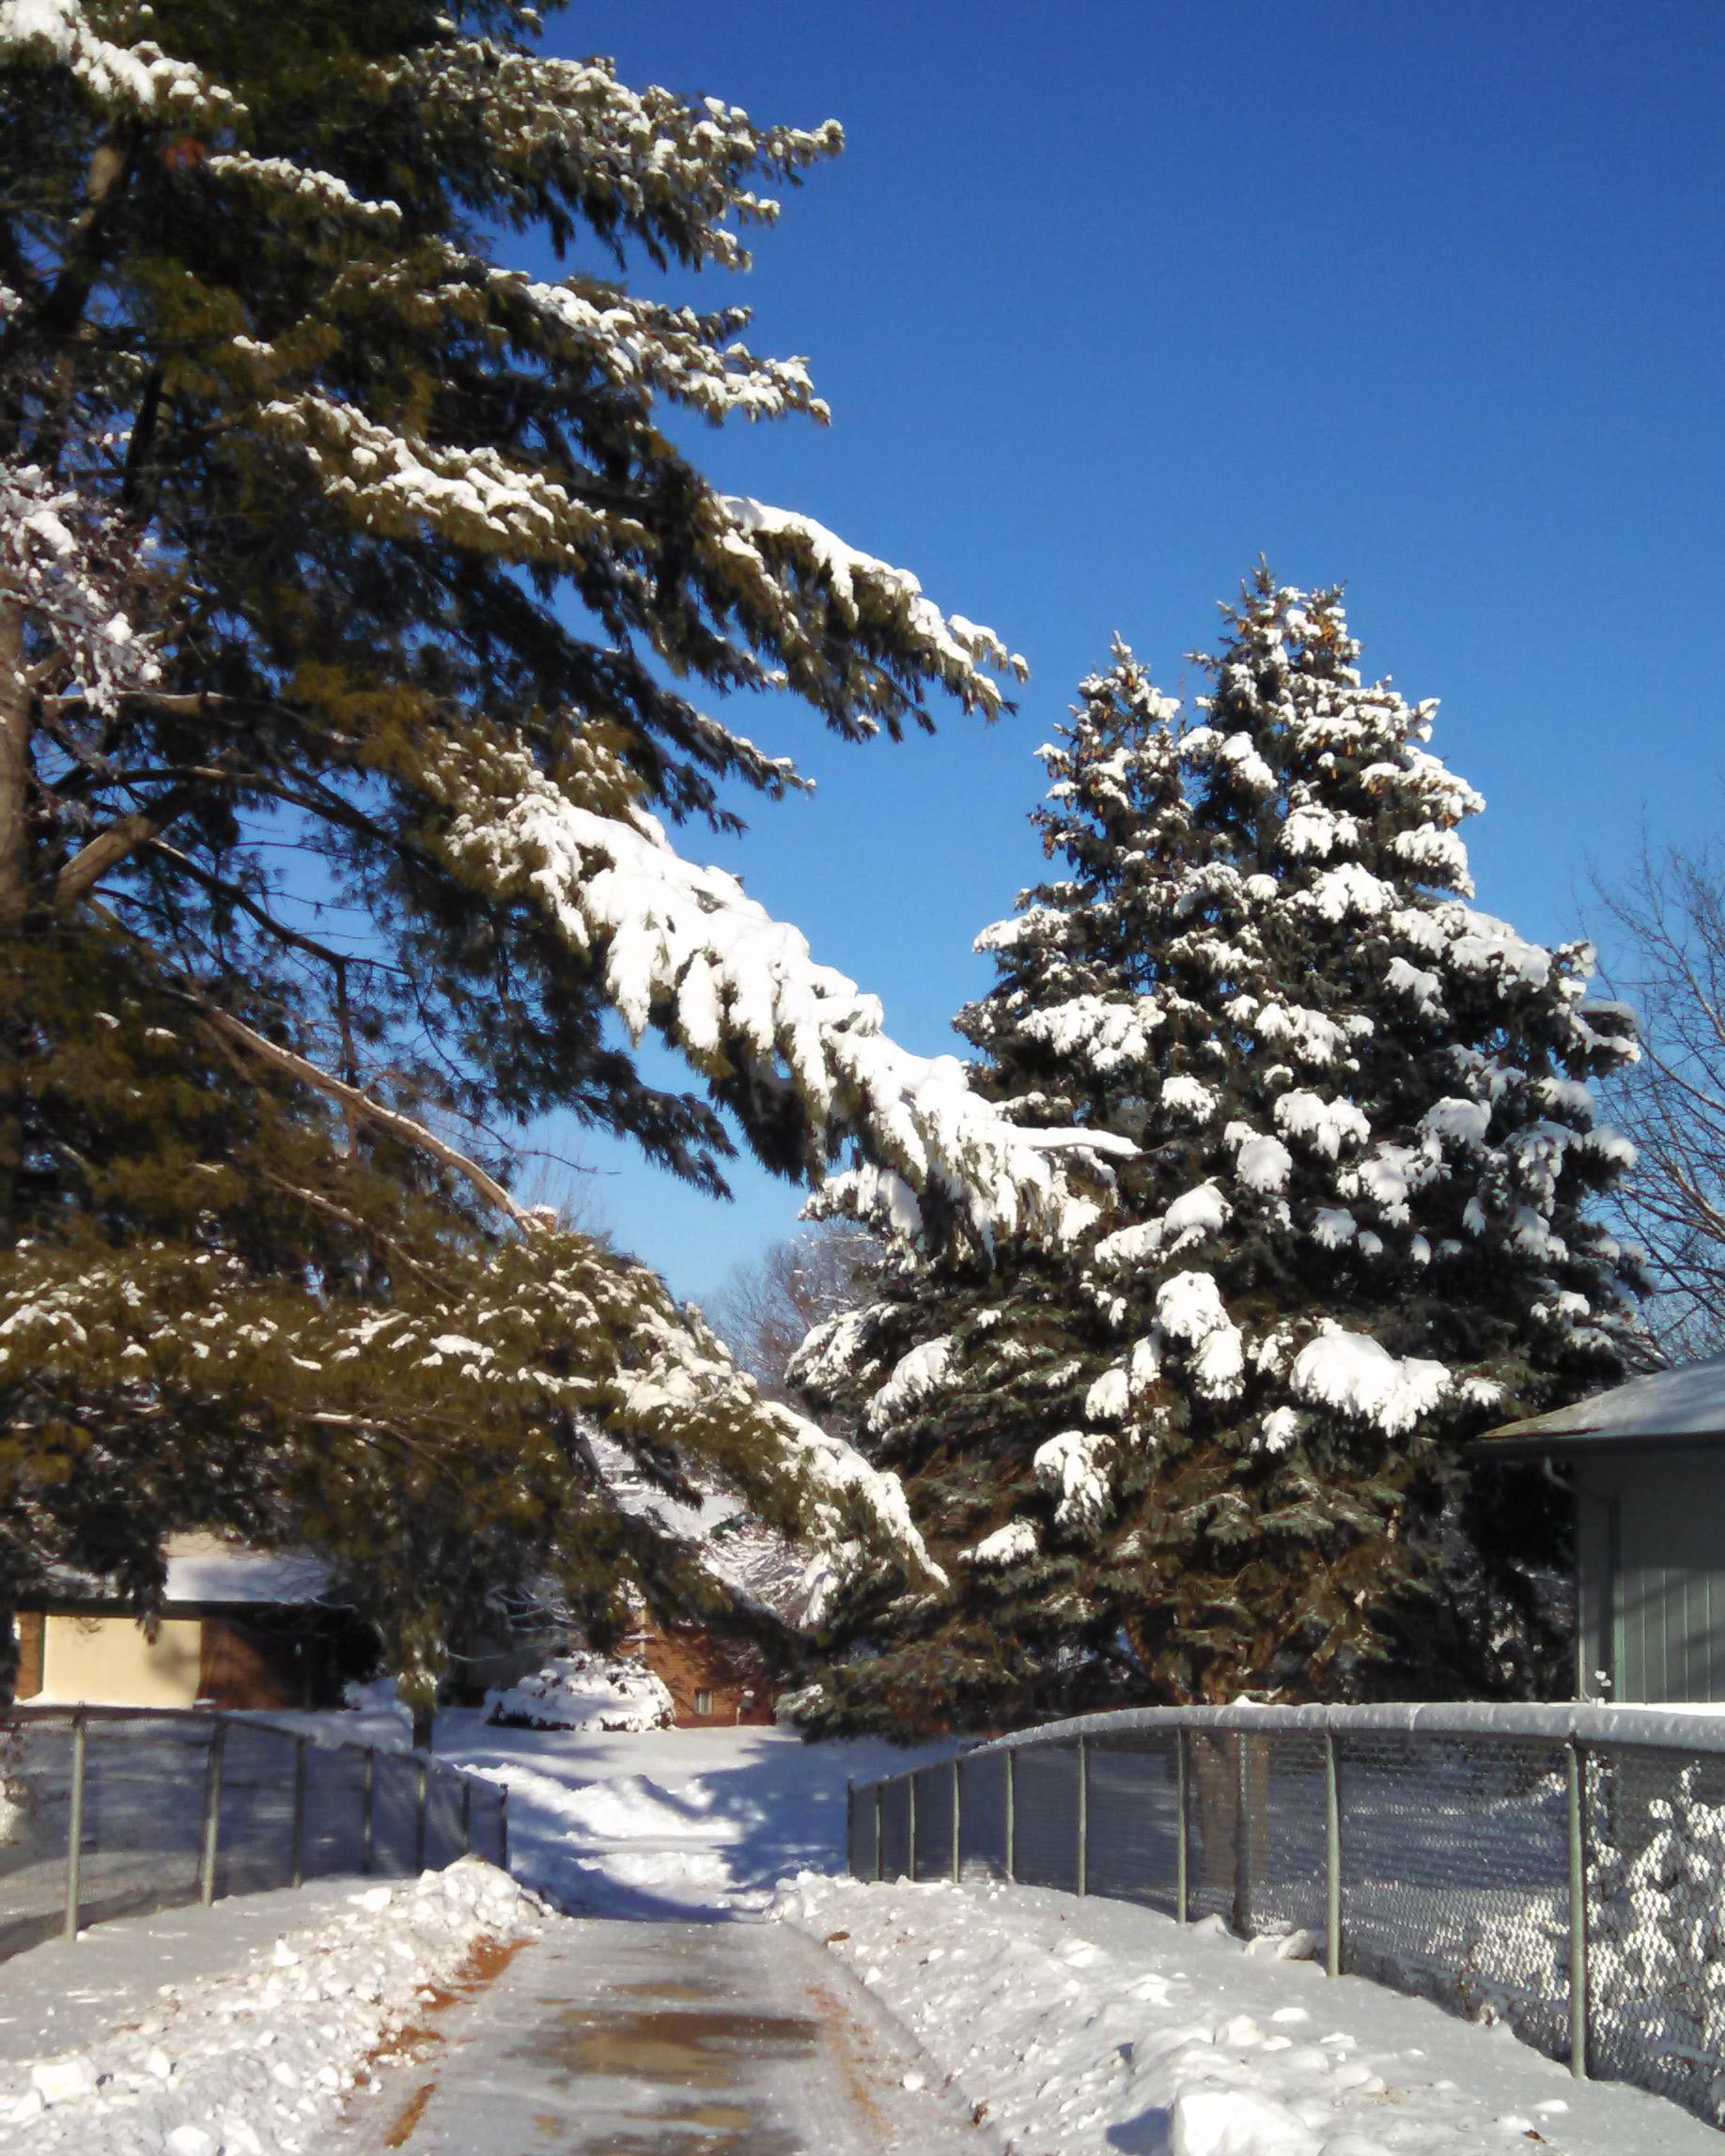 Snow loading on trees